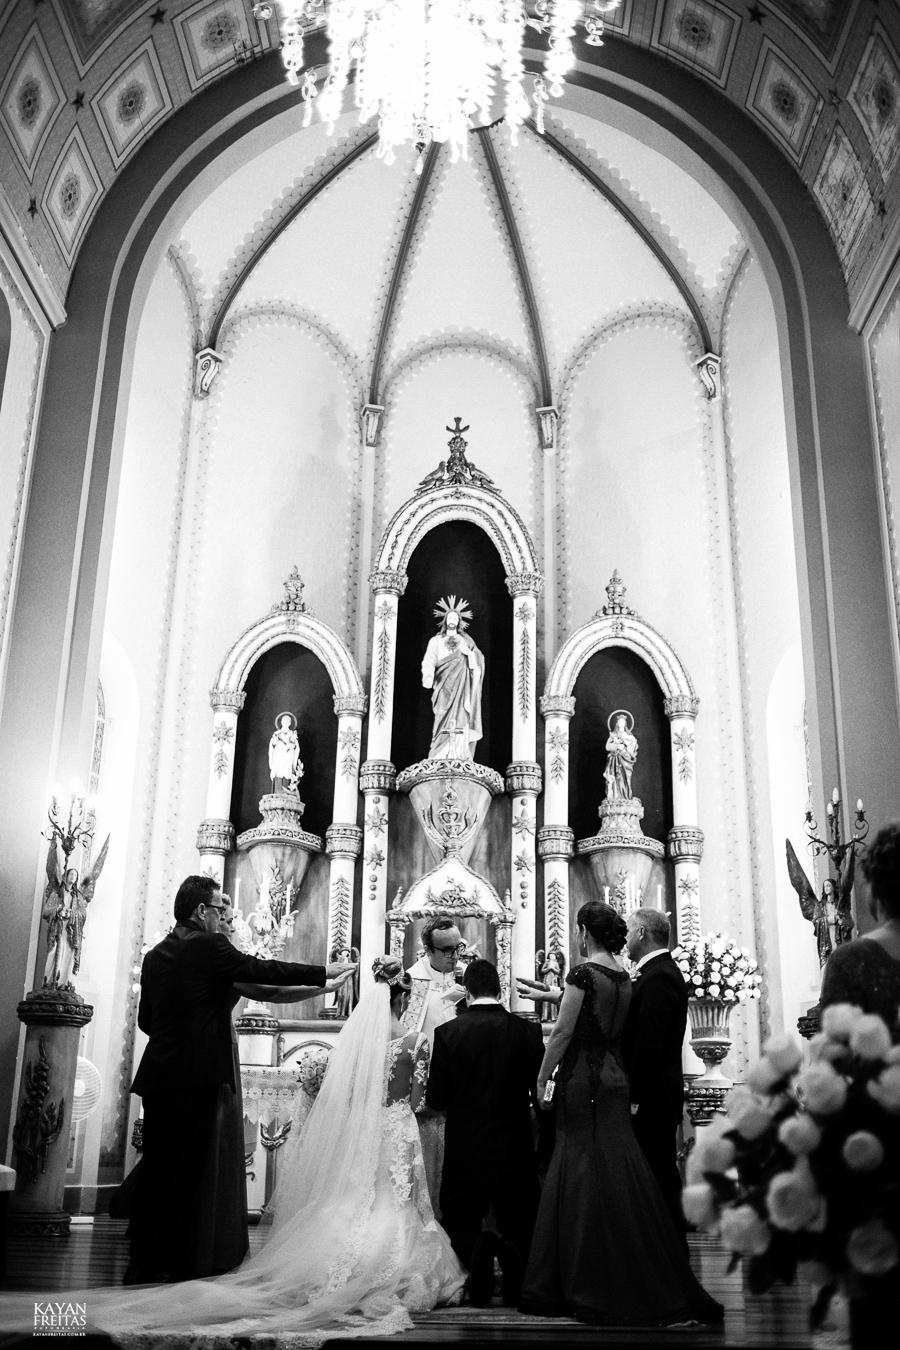 casamento-florianopolis-paula-ramos-0091 Casamento Fabiana e Rafael - Paula Ramos - Florianópolis